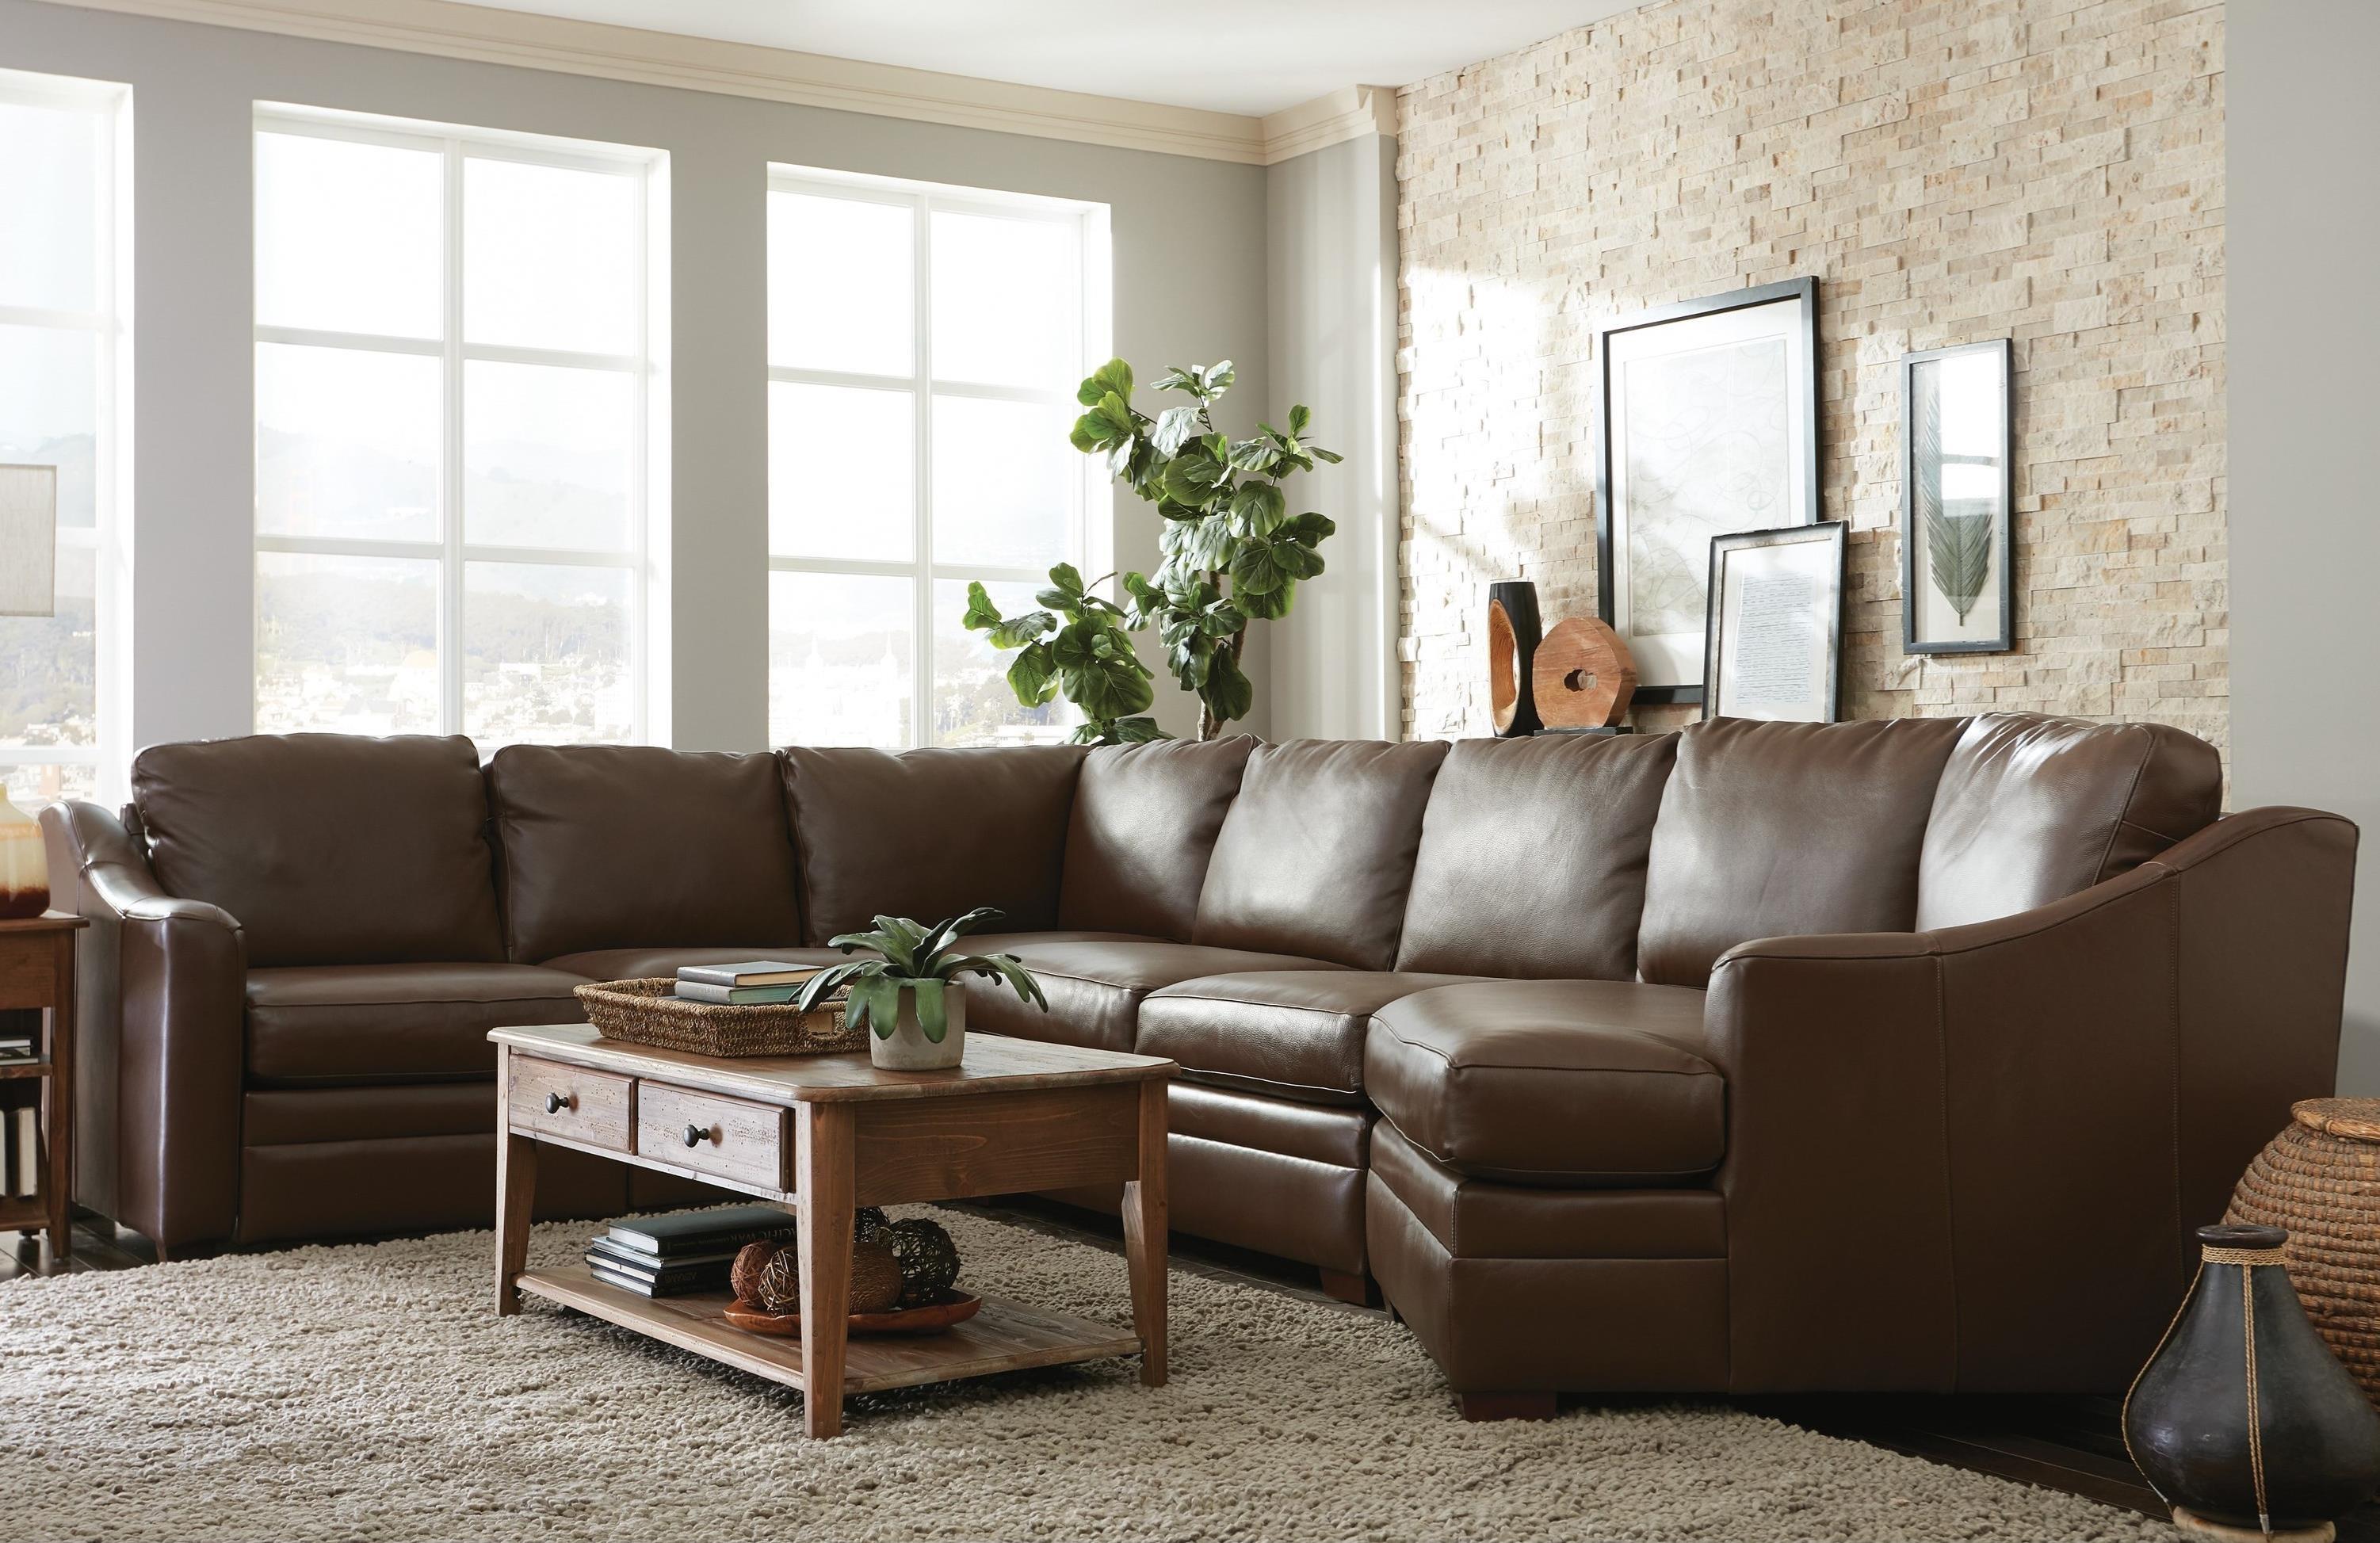 Merveilleux Craftmaster L9 Custom   Design Options3 Pc Sectional Sofa W/ Power Recliner  ...